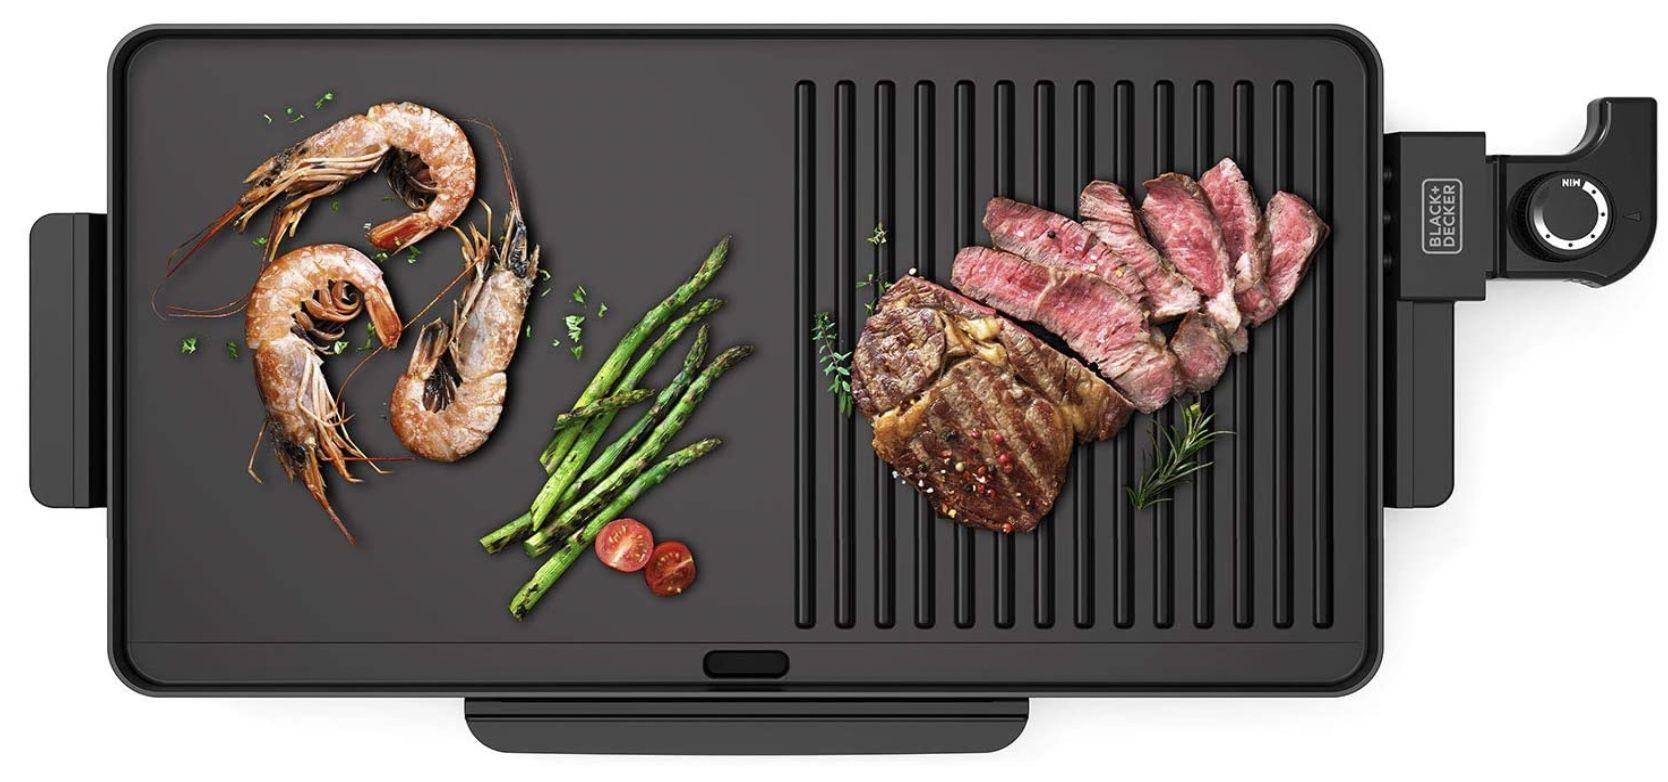 Black+Decker BXGD2200E antihaftbeschichteter Grill mit 2.200Watt & 49x27cm Grillfläche für 17,85€ (statt 39€)